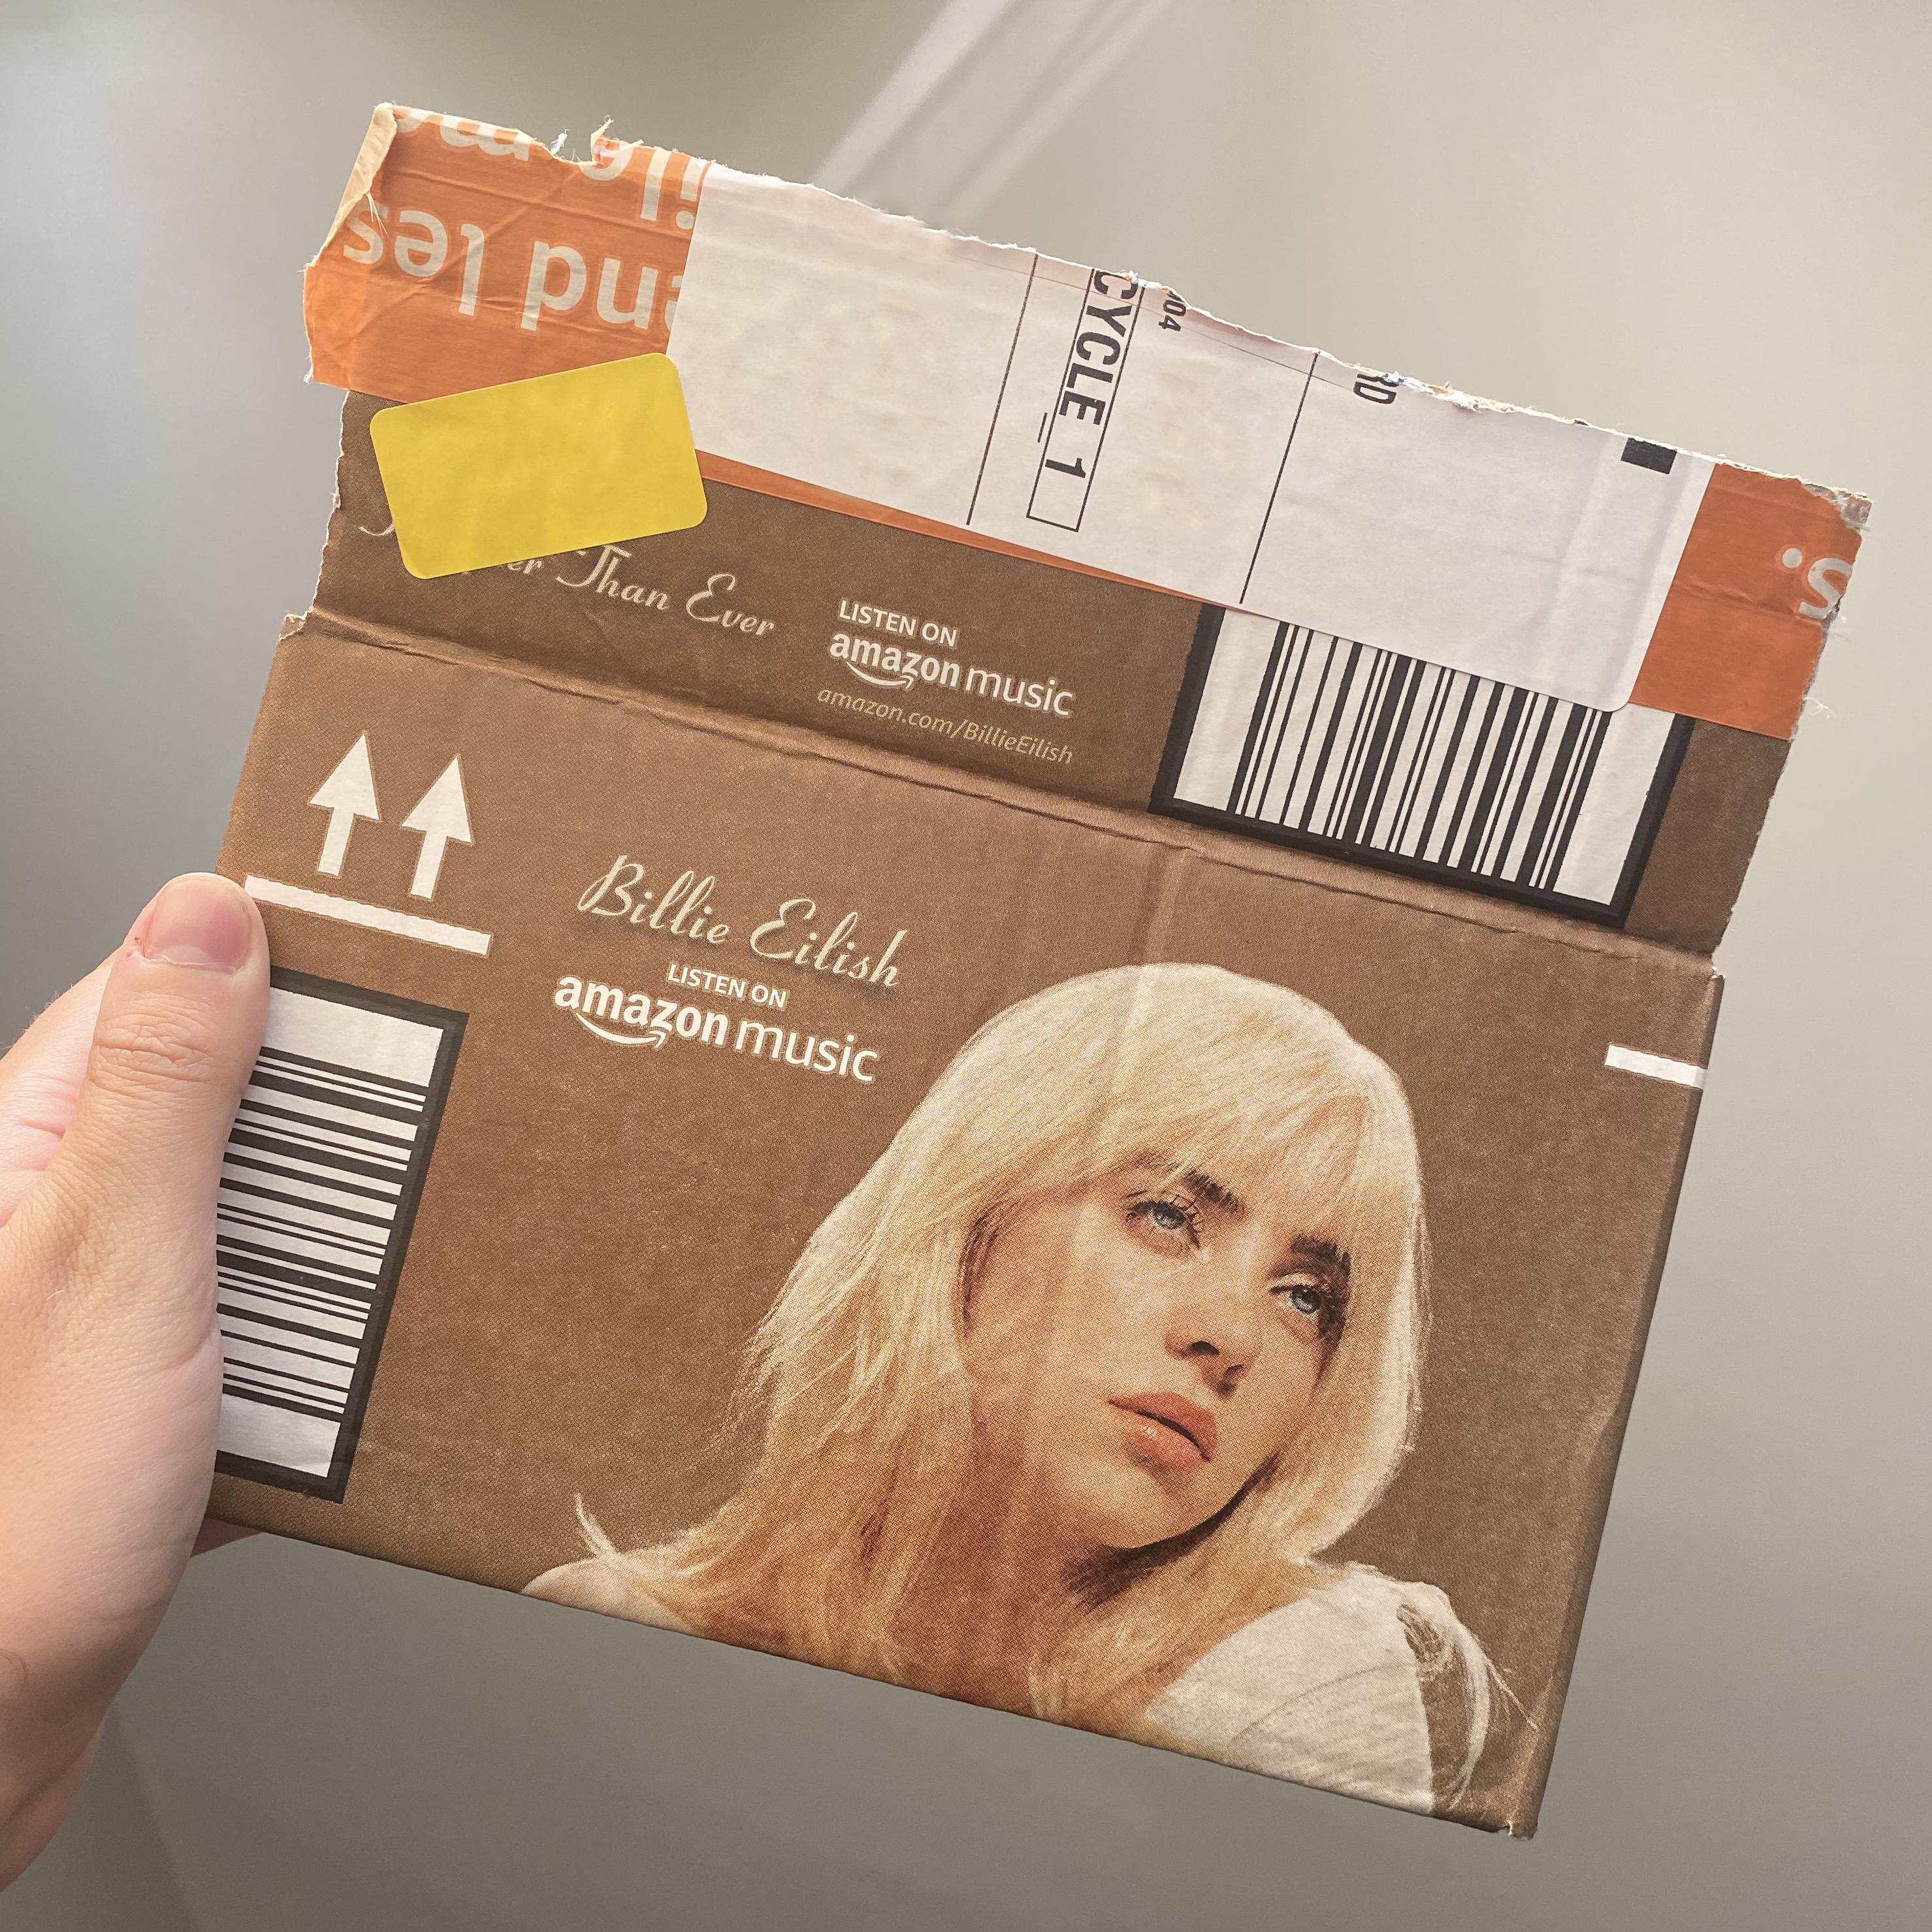 Happier Than Ever Billie Eilish Amazon Box